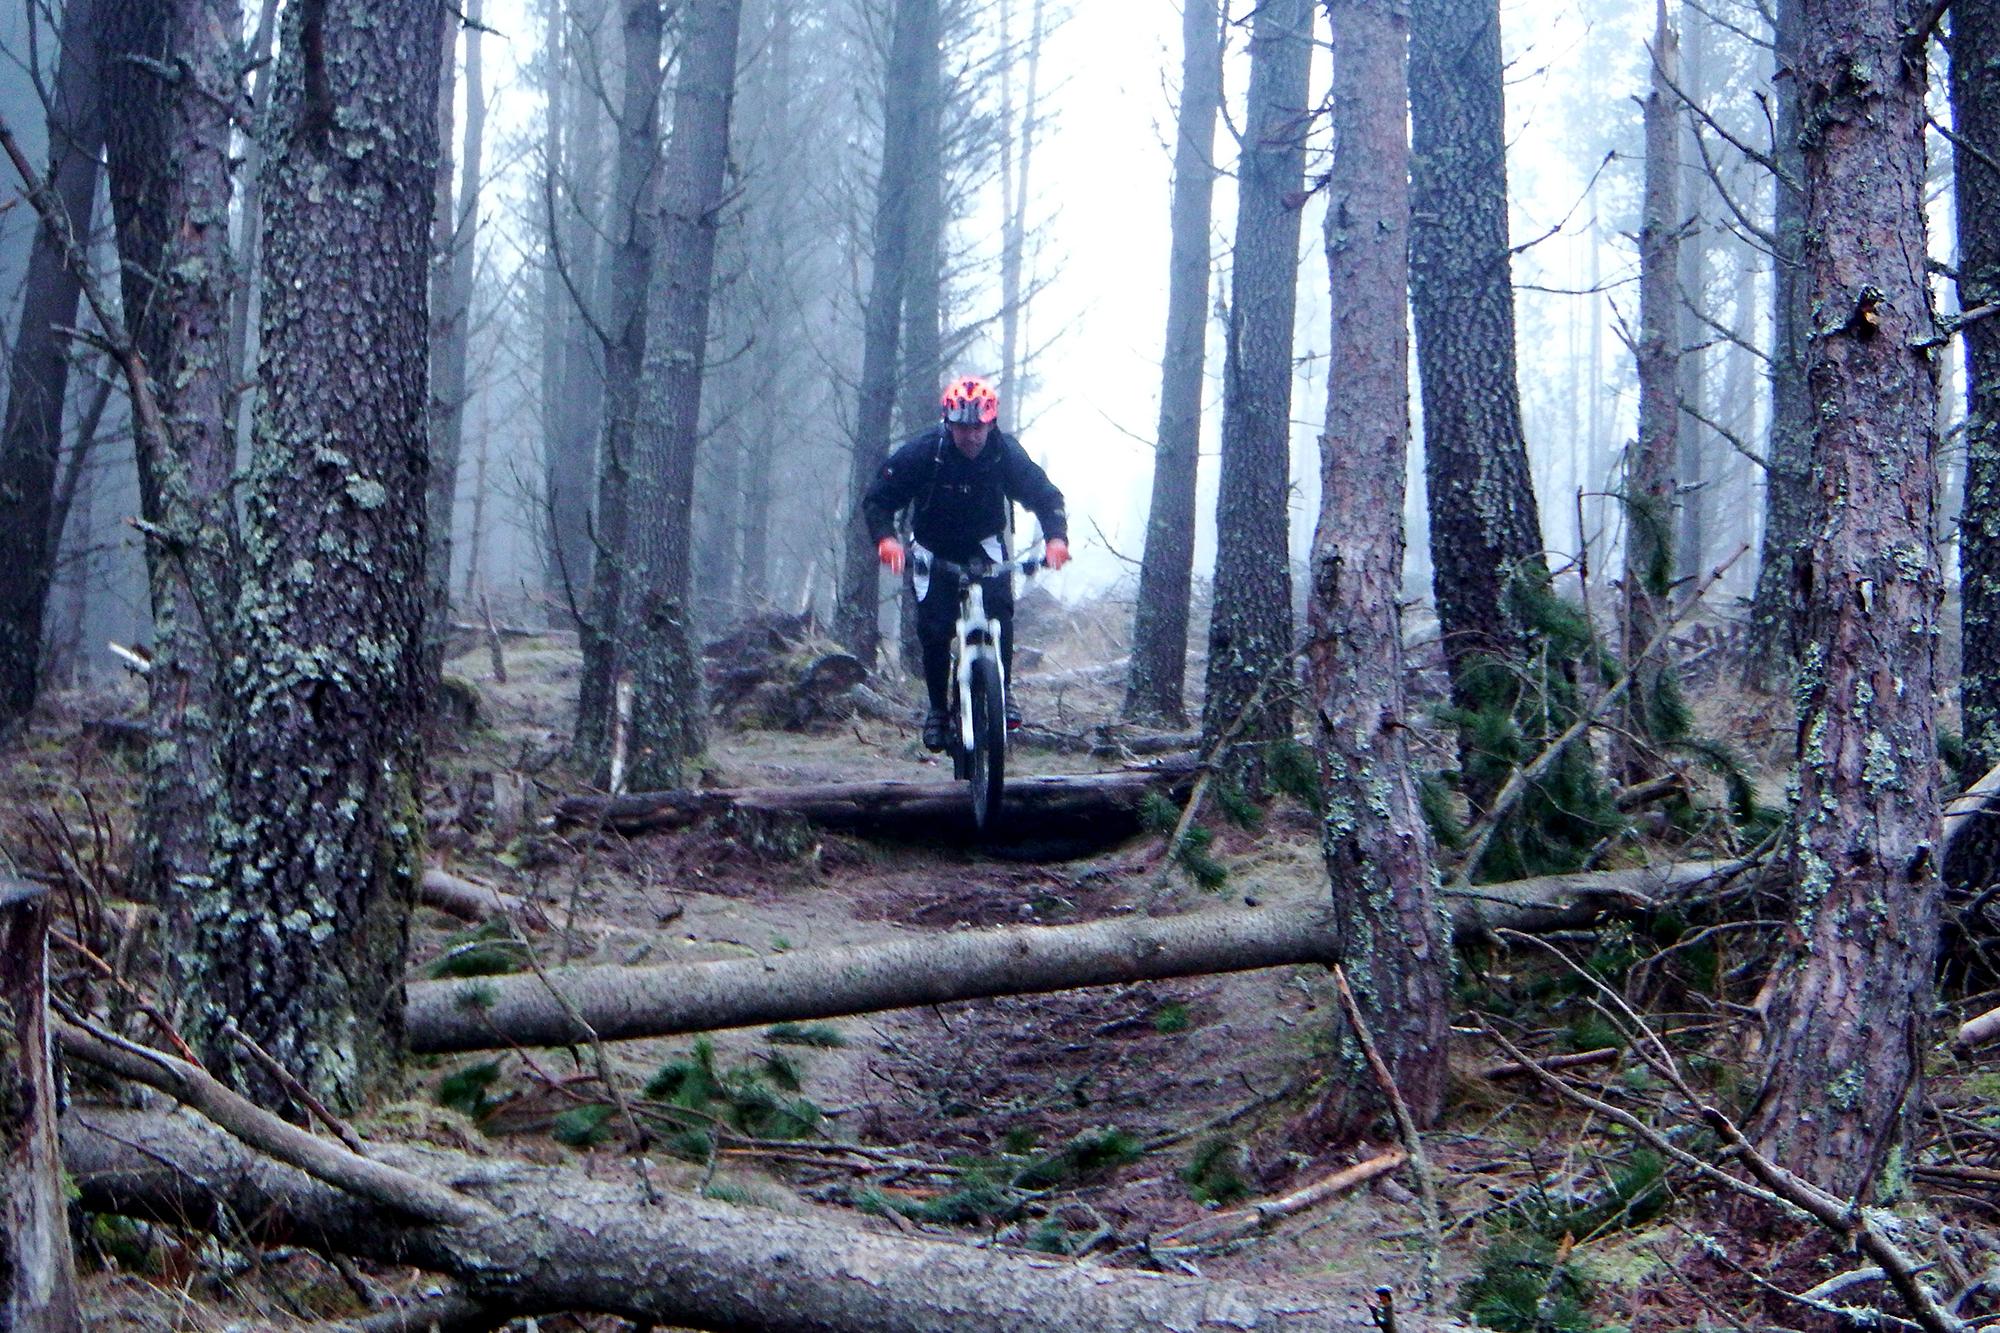 Jonny mcconnell Riding Enduro Trails Lapierre High Burnside Aviemore